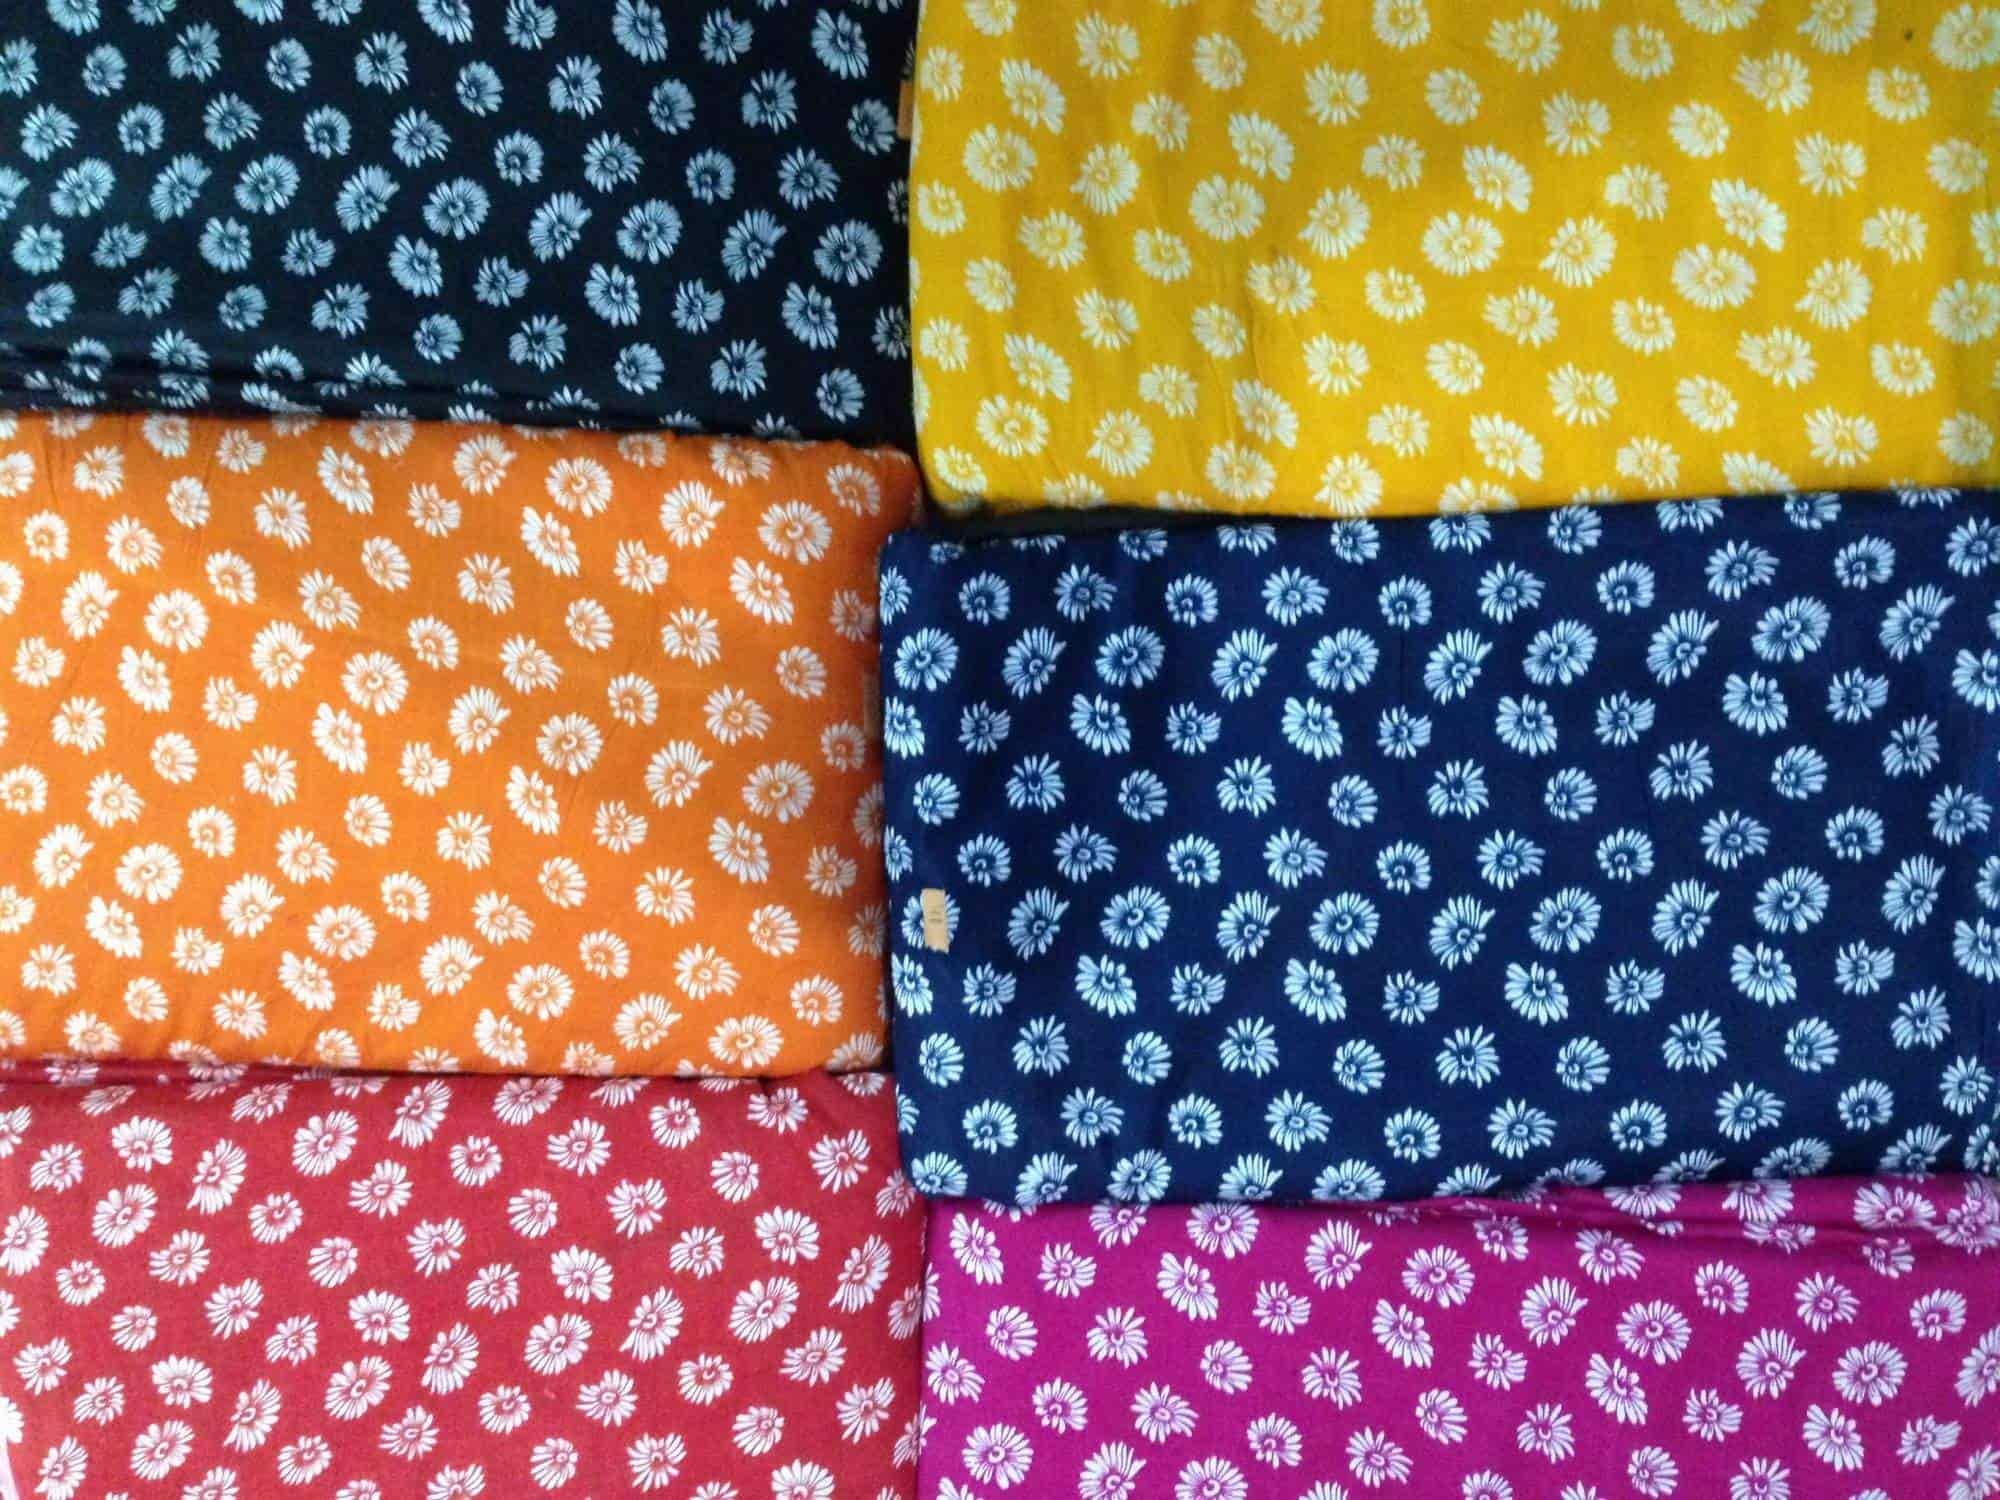 swastik textiles photos shastri nagar jodhpur pictures images